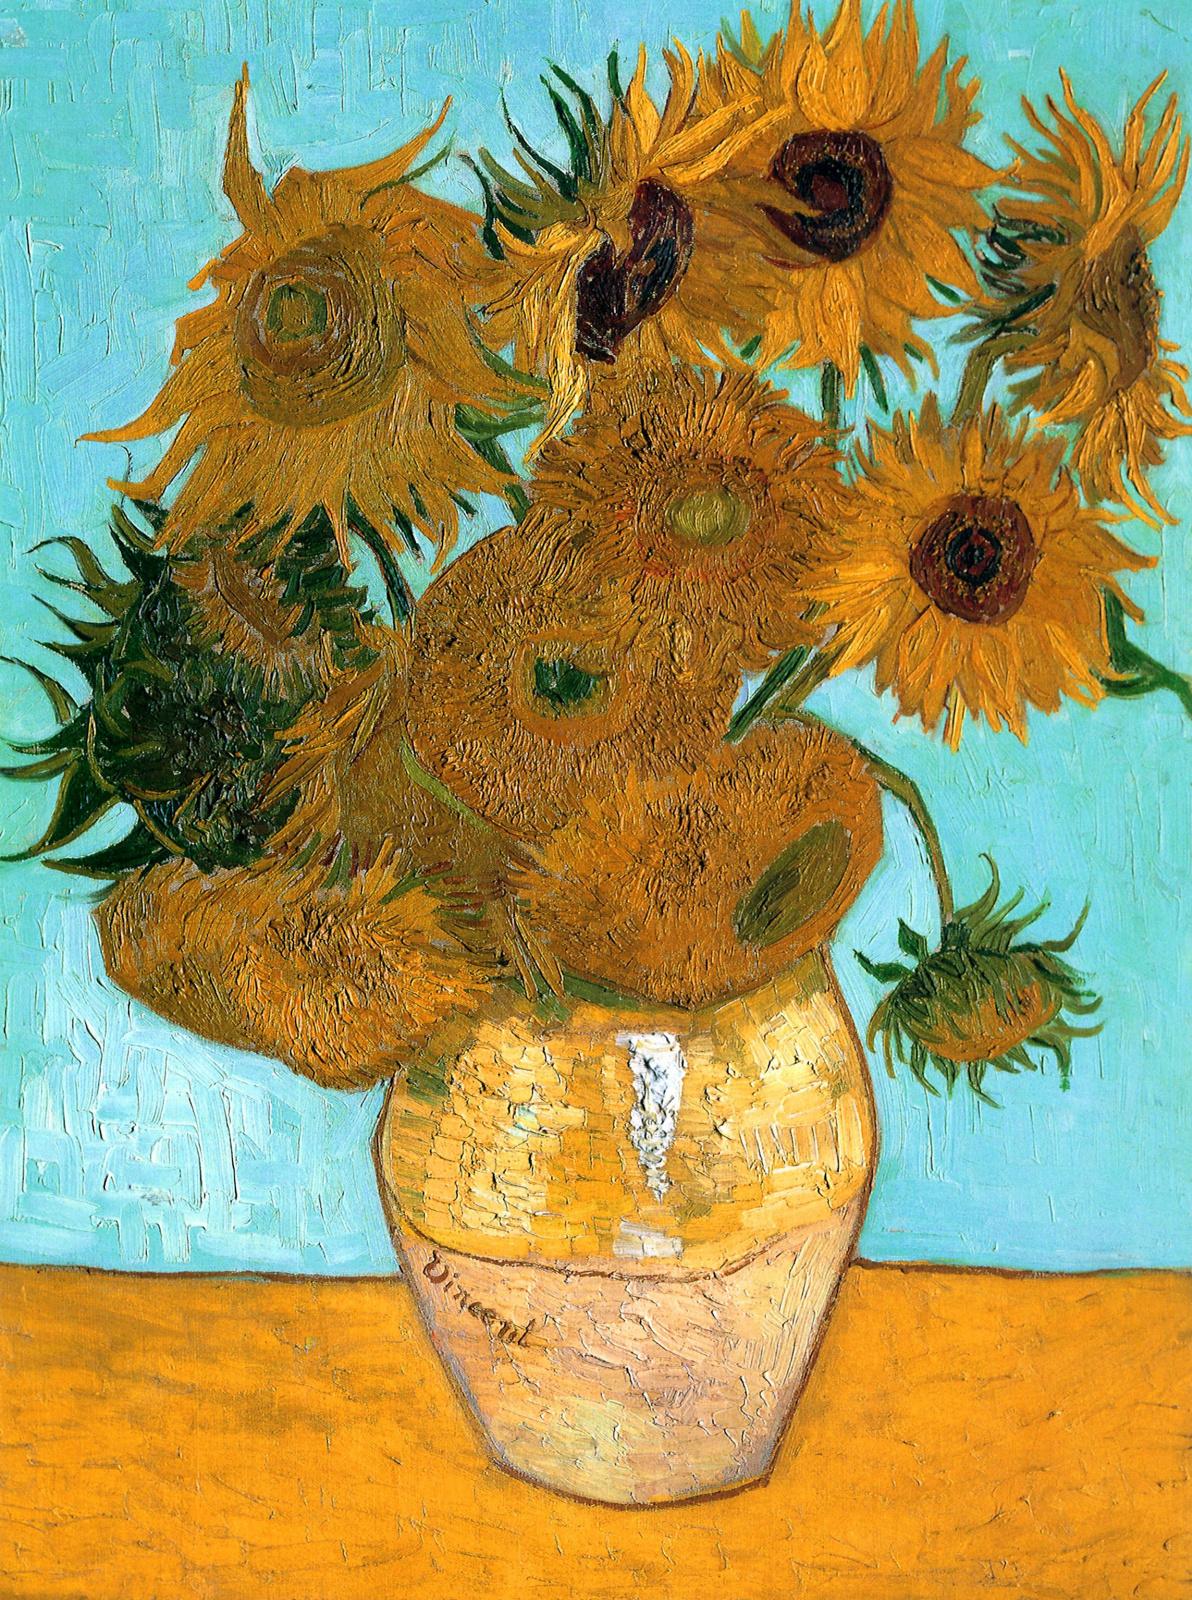 Винсент Ван Гог. Двенадцать подсолнухов в вазе